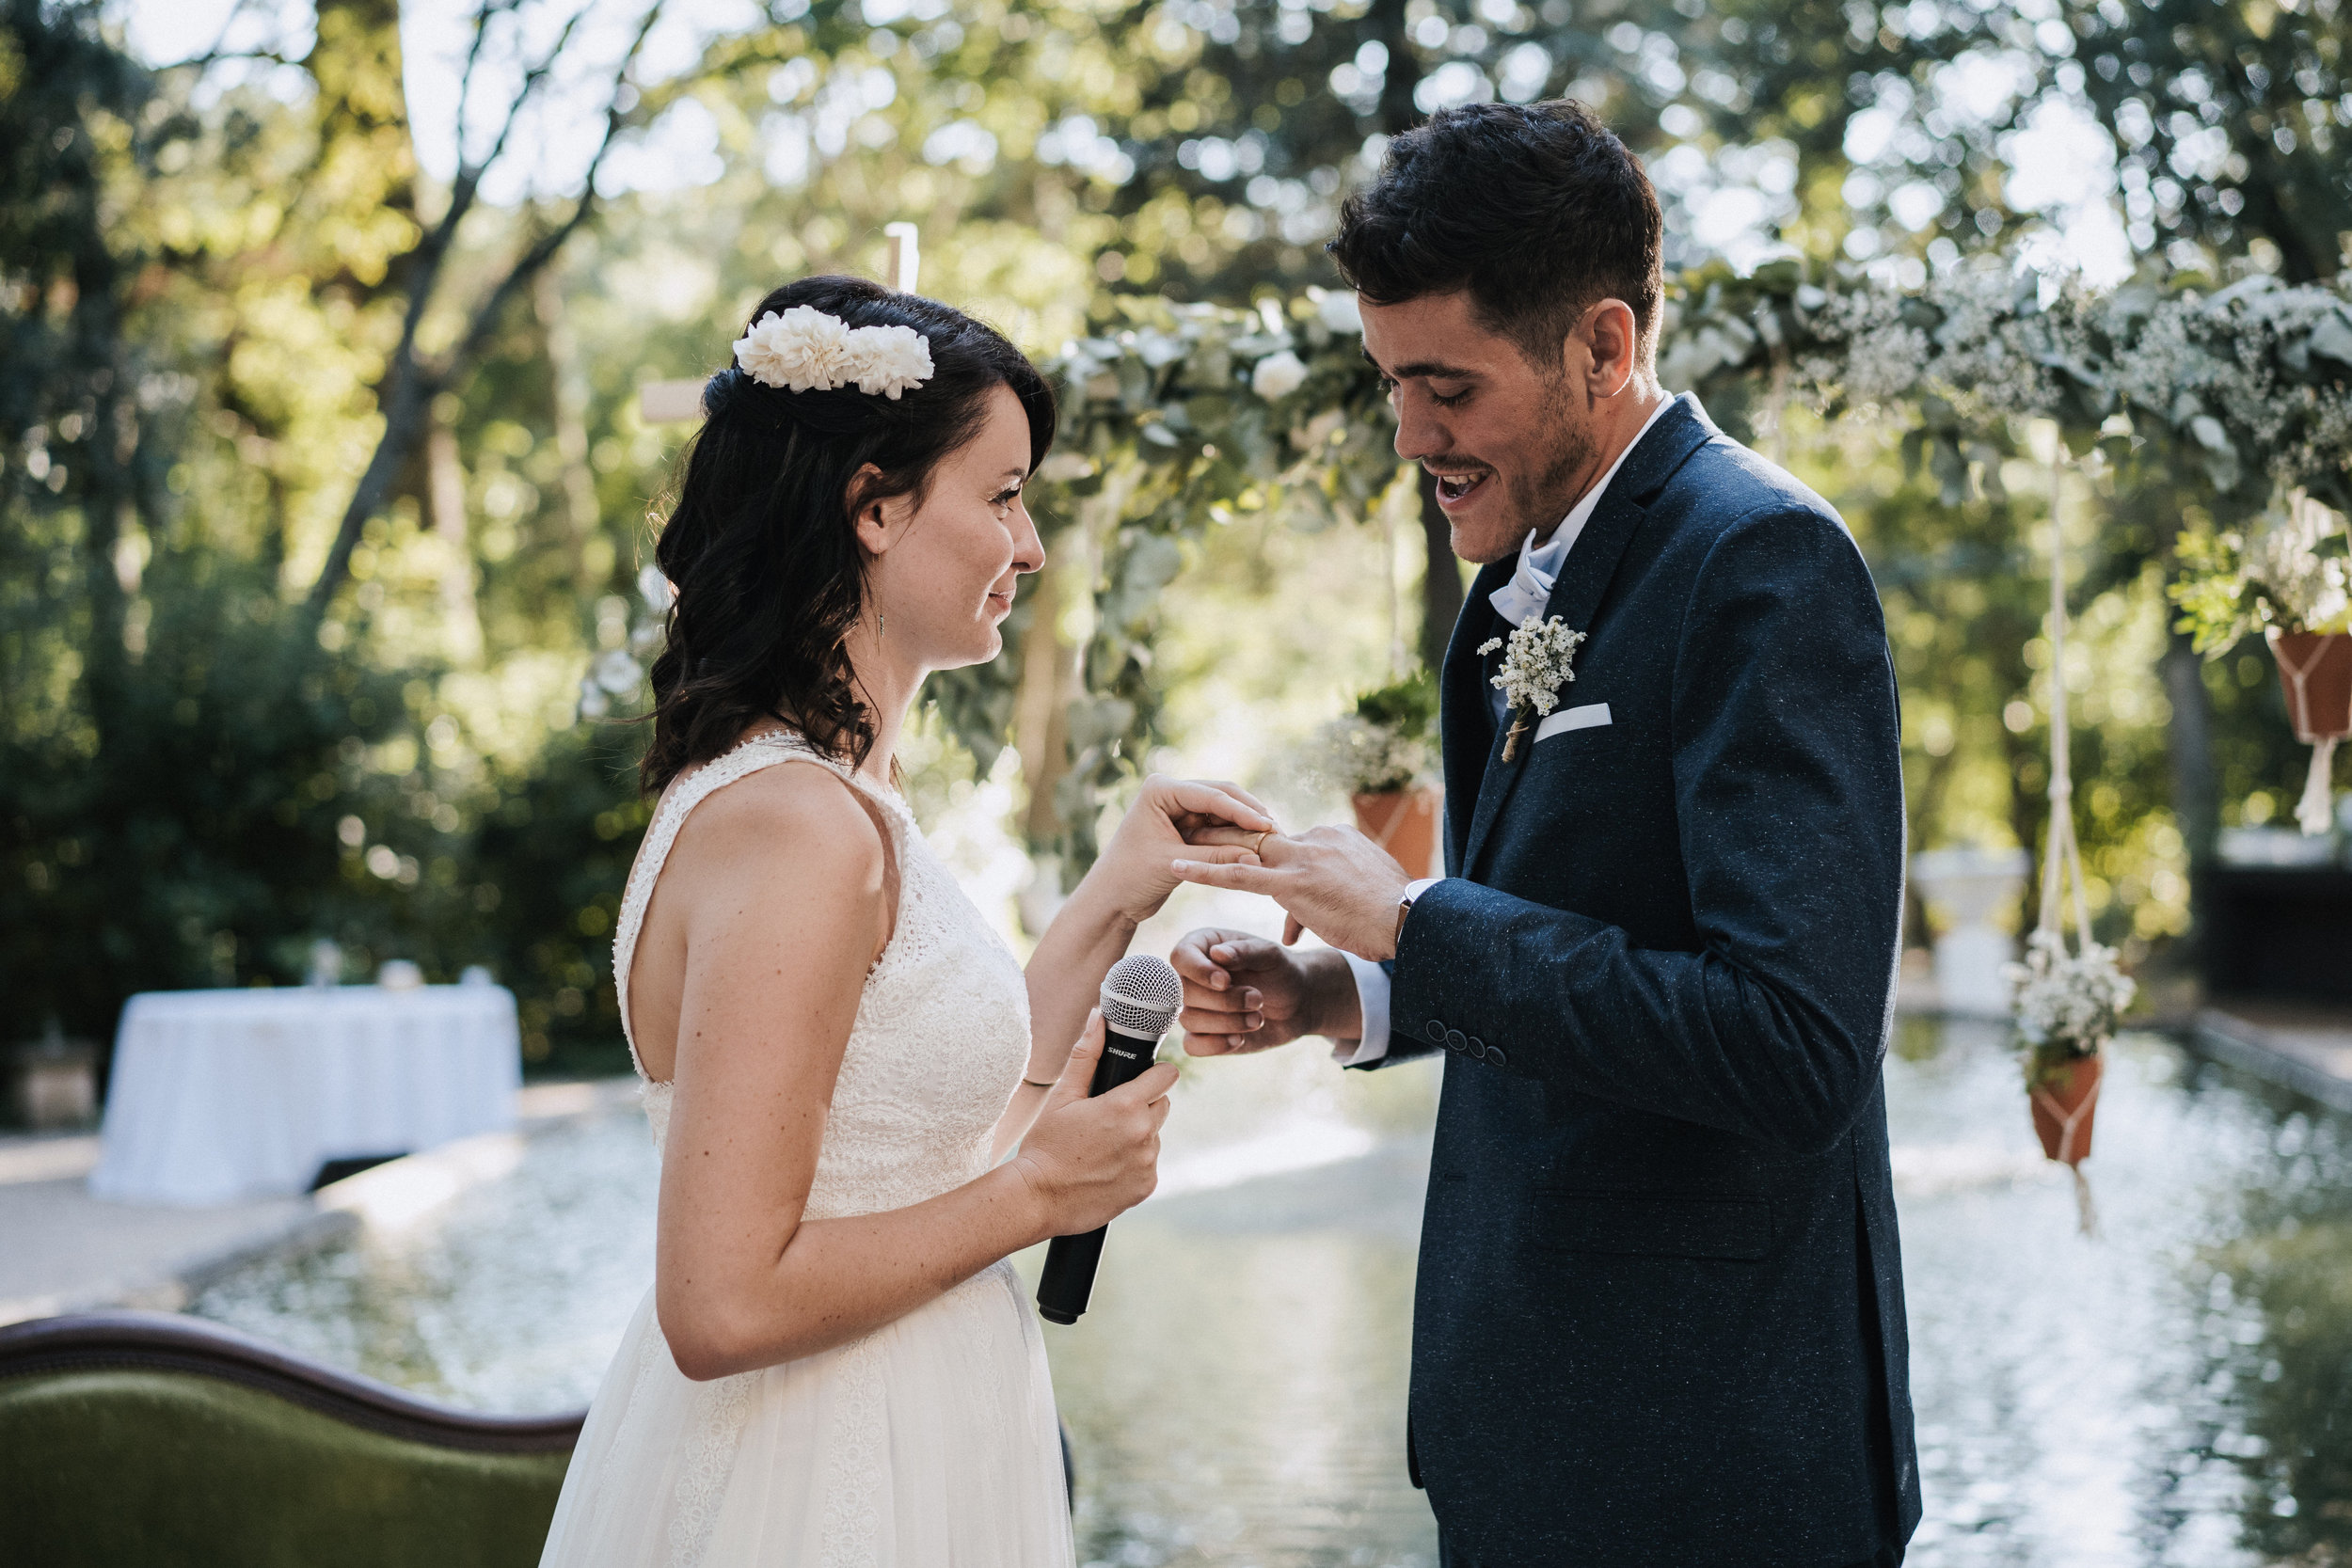 Wedding_provence_neupapphotography_E+Y_chateau_de_mont_vert-473.jpg